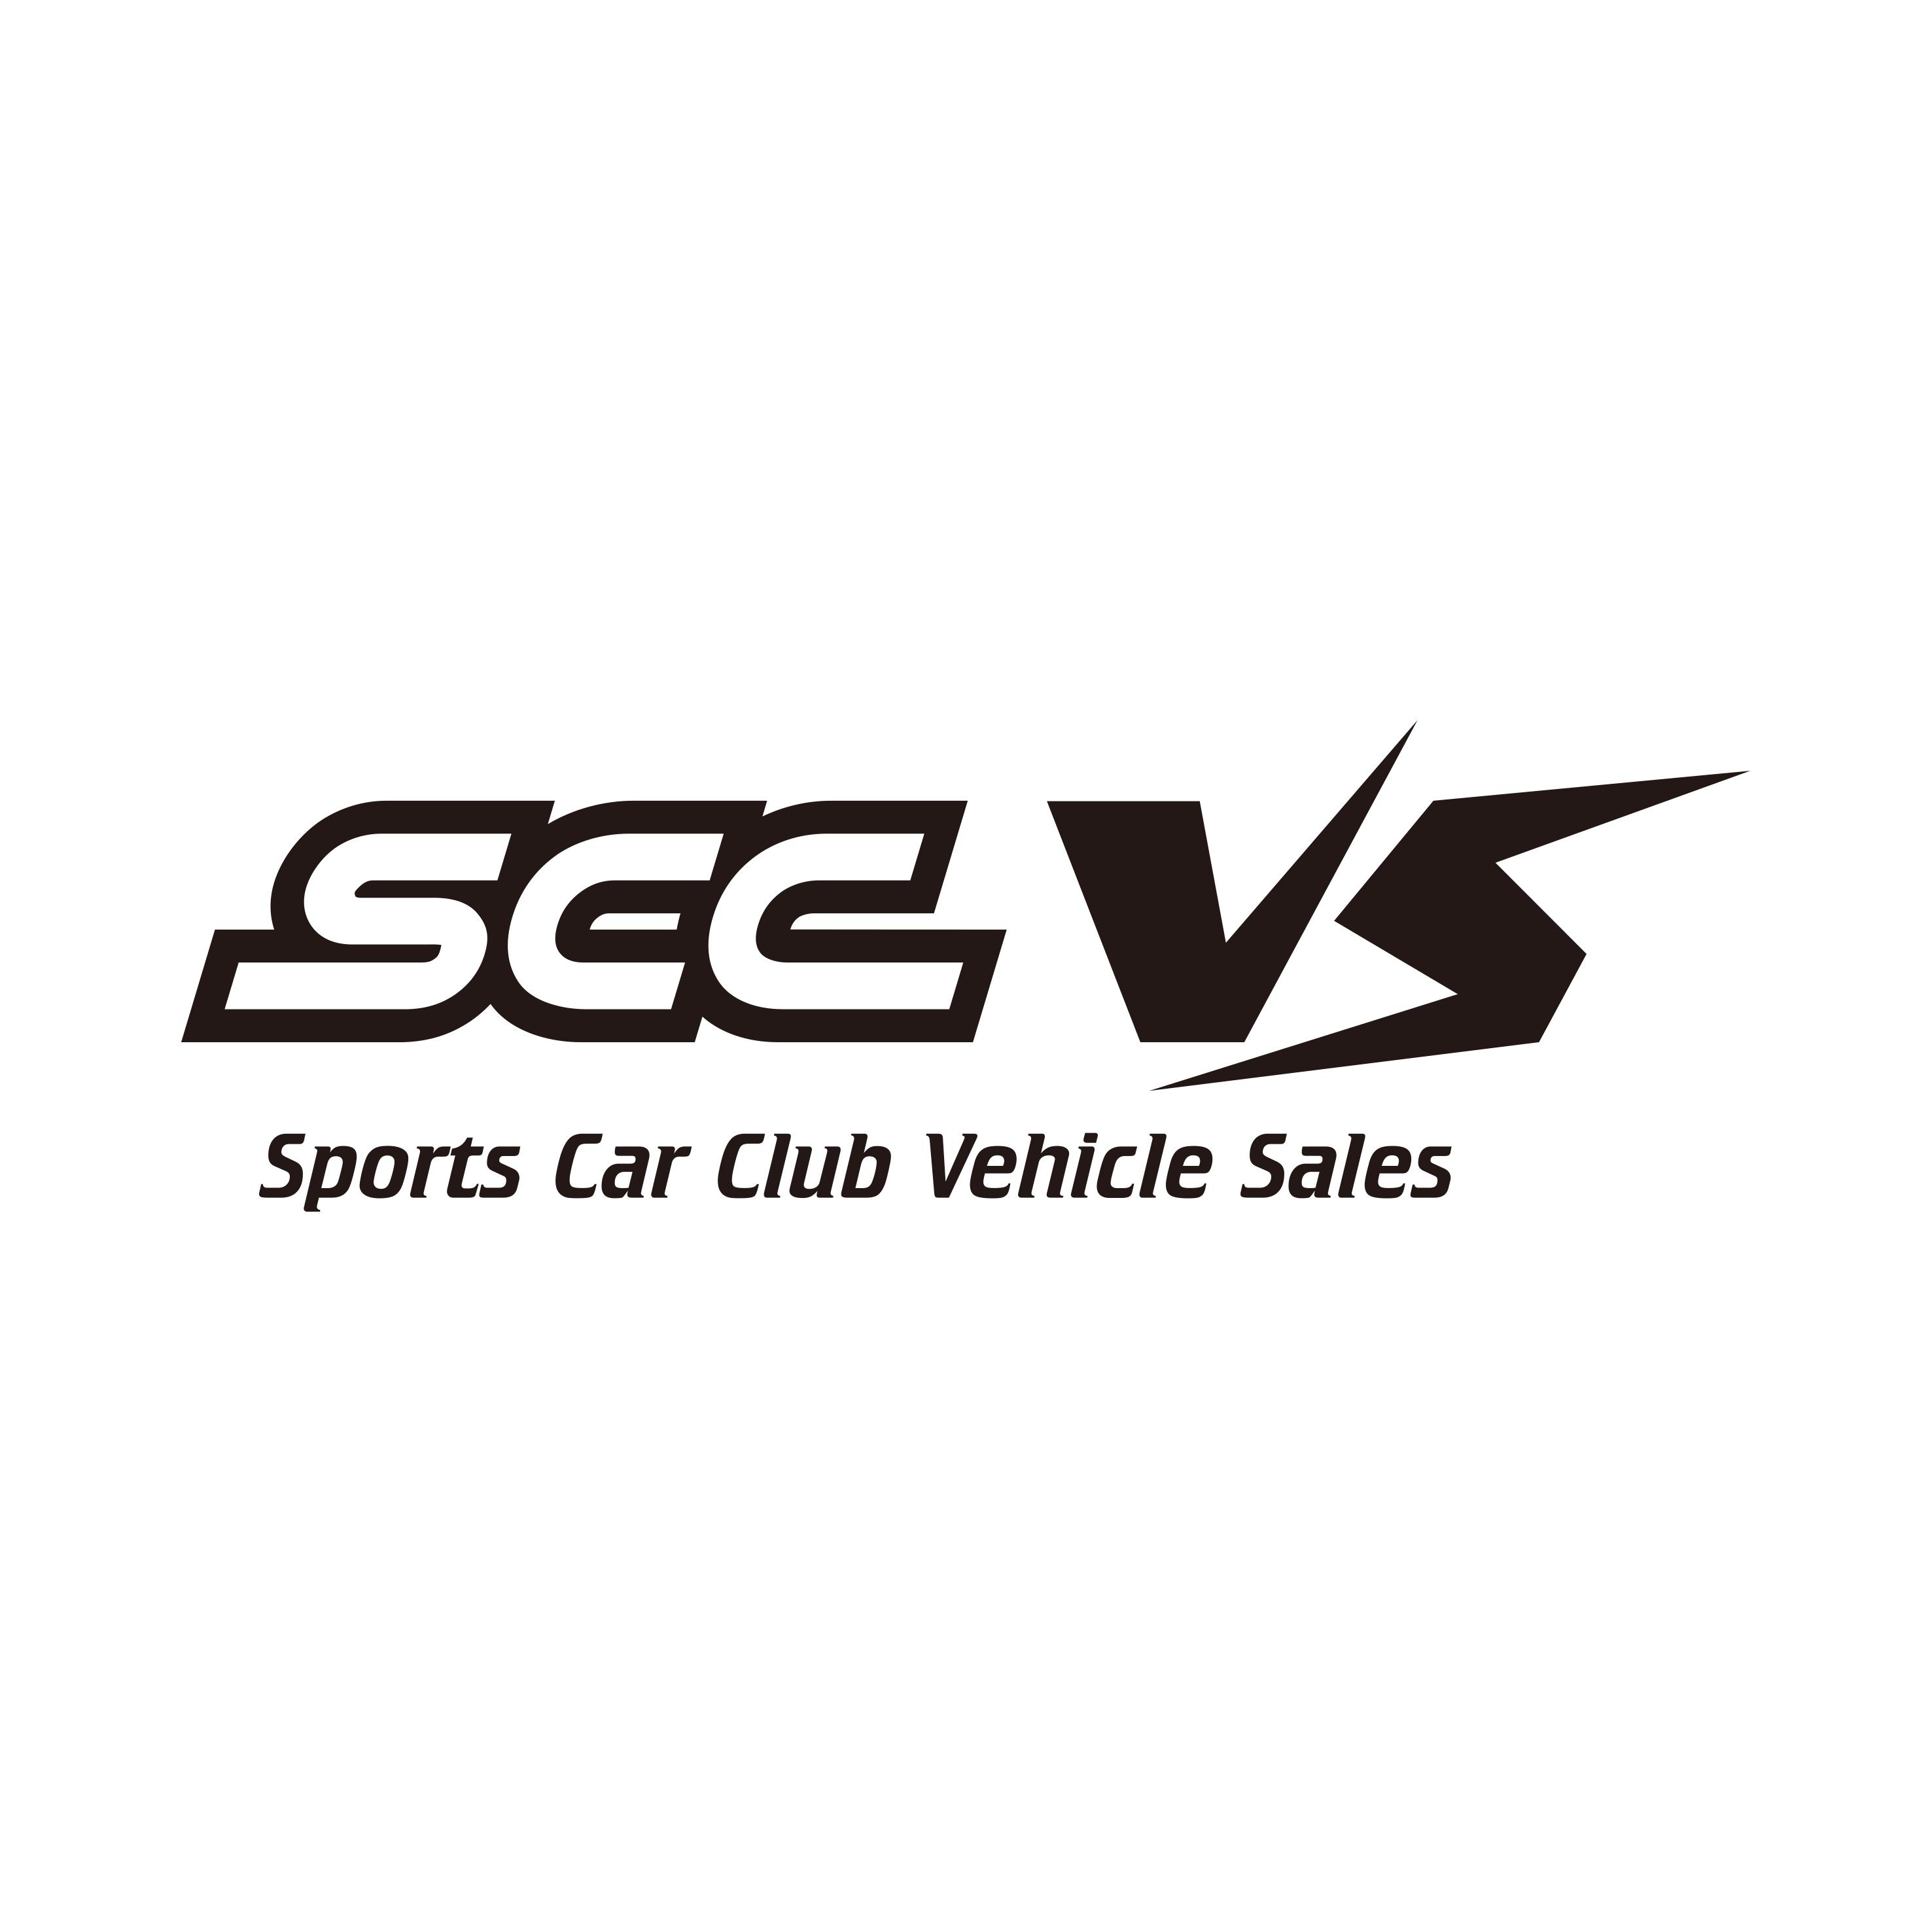 SCCVS超跑销售中心